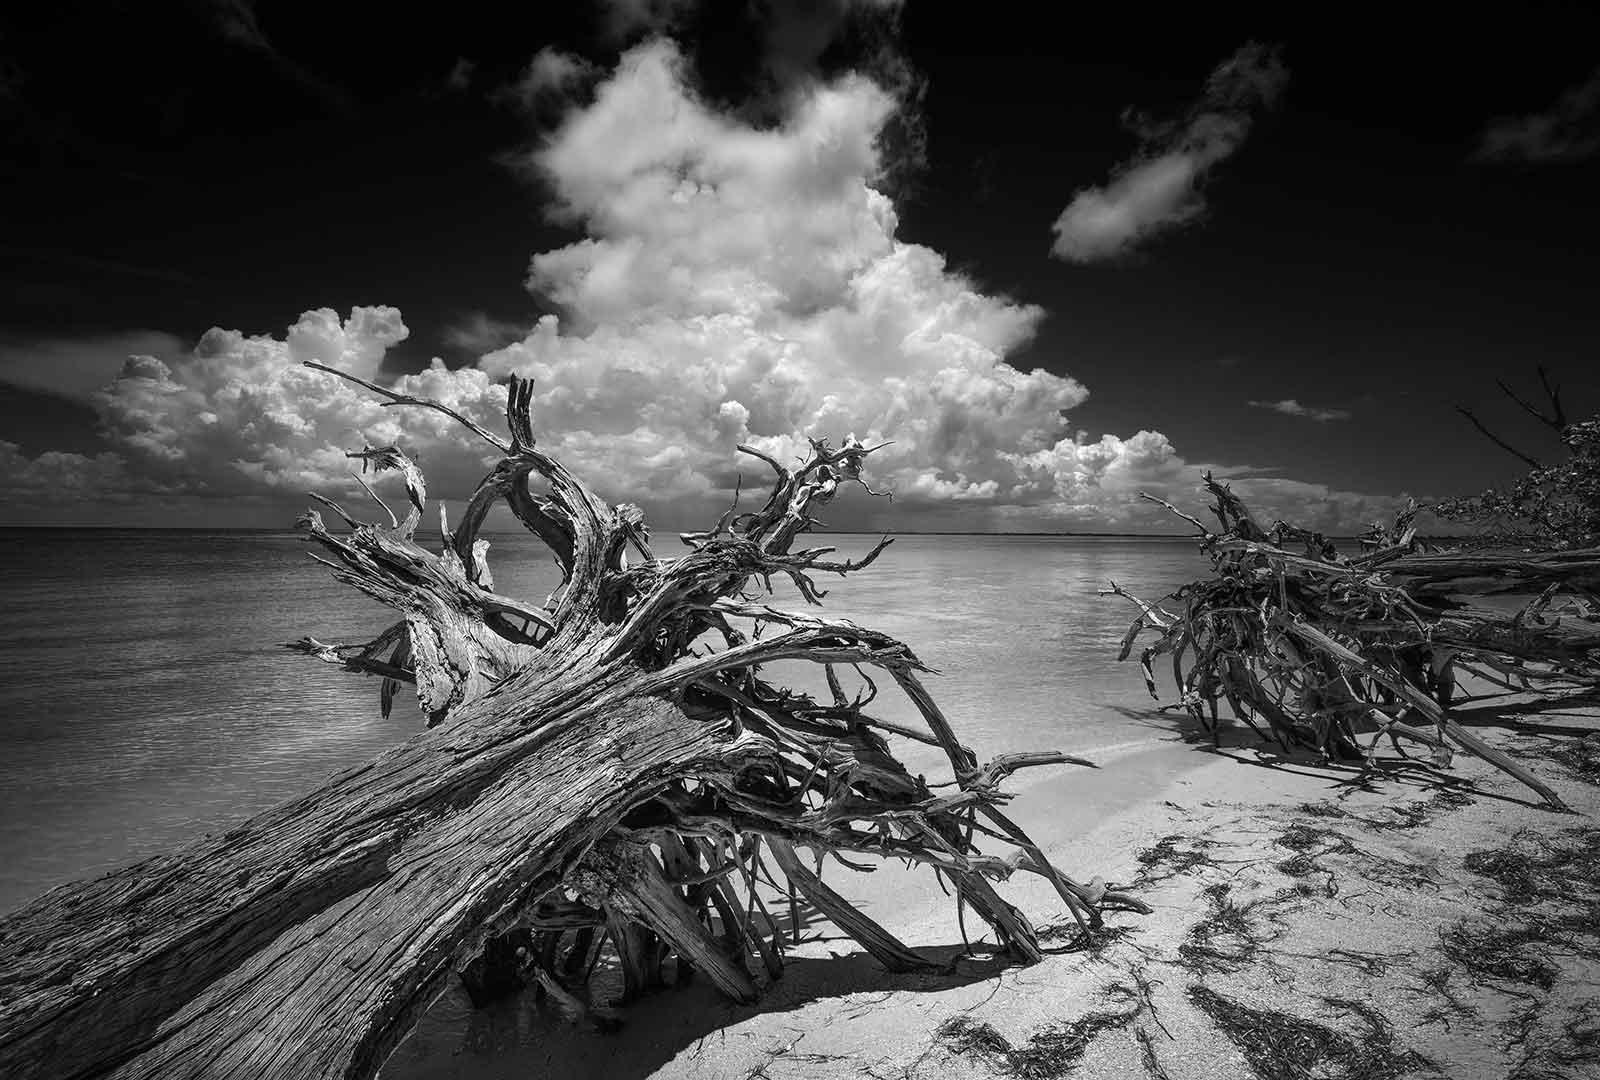 Cayo Costa Driftwood 2 169 2015 Clyde Butcher Black